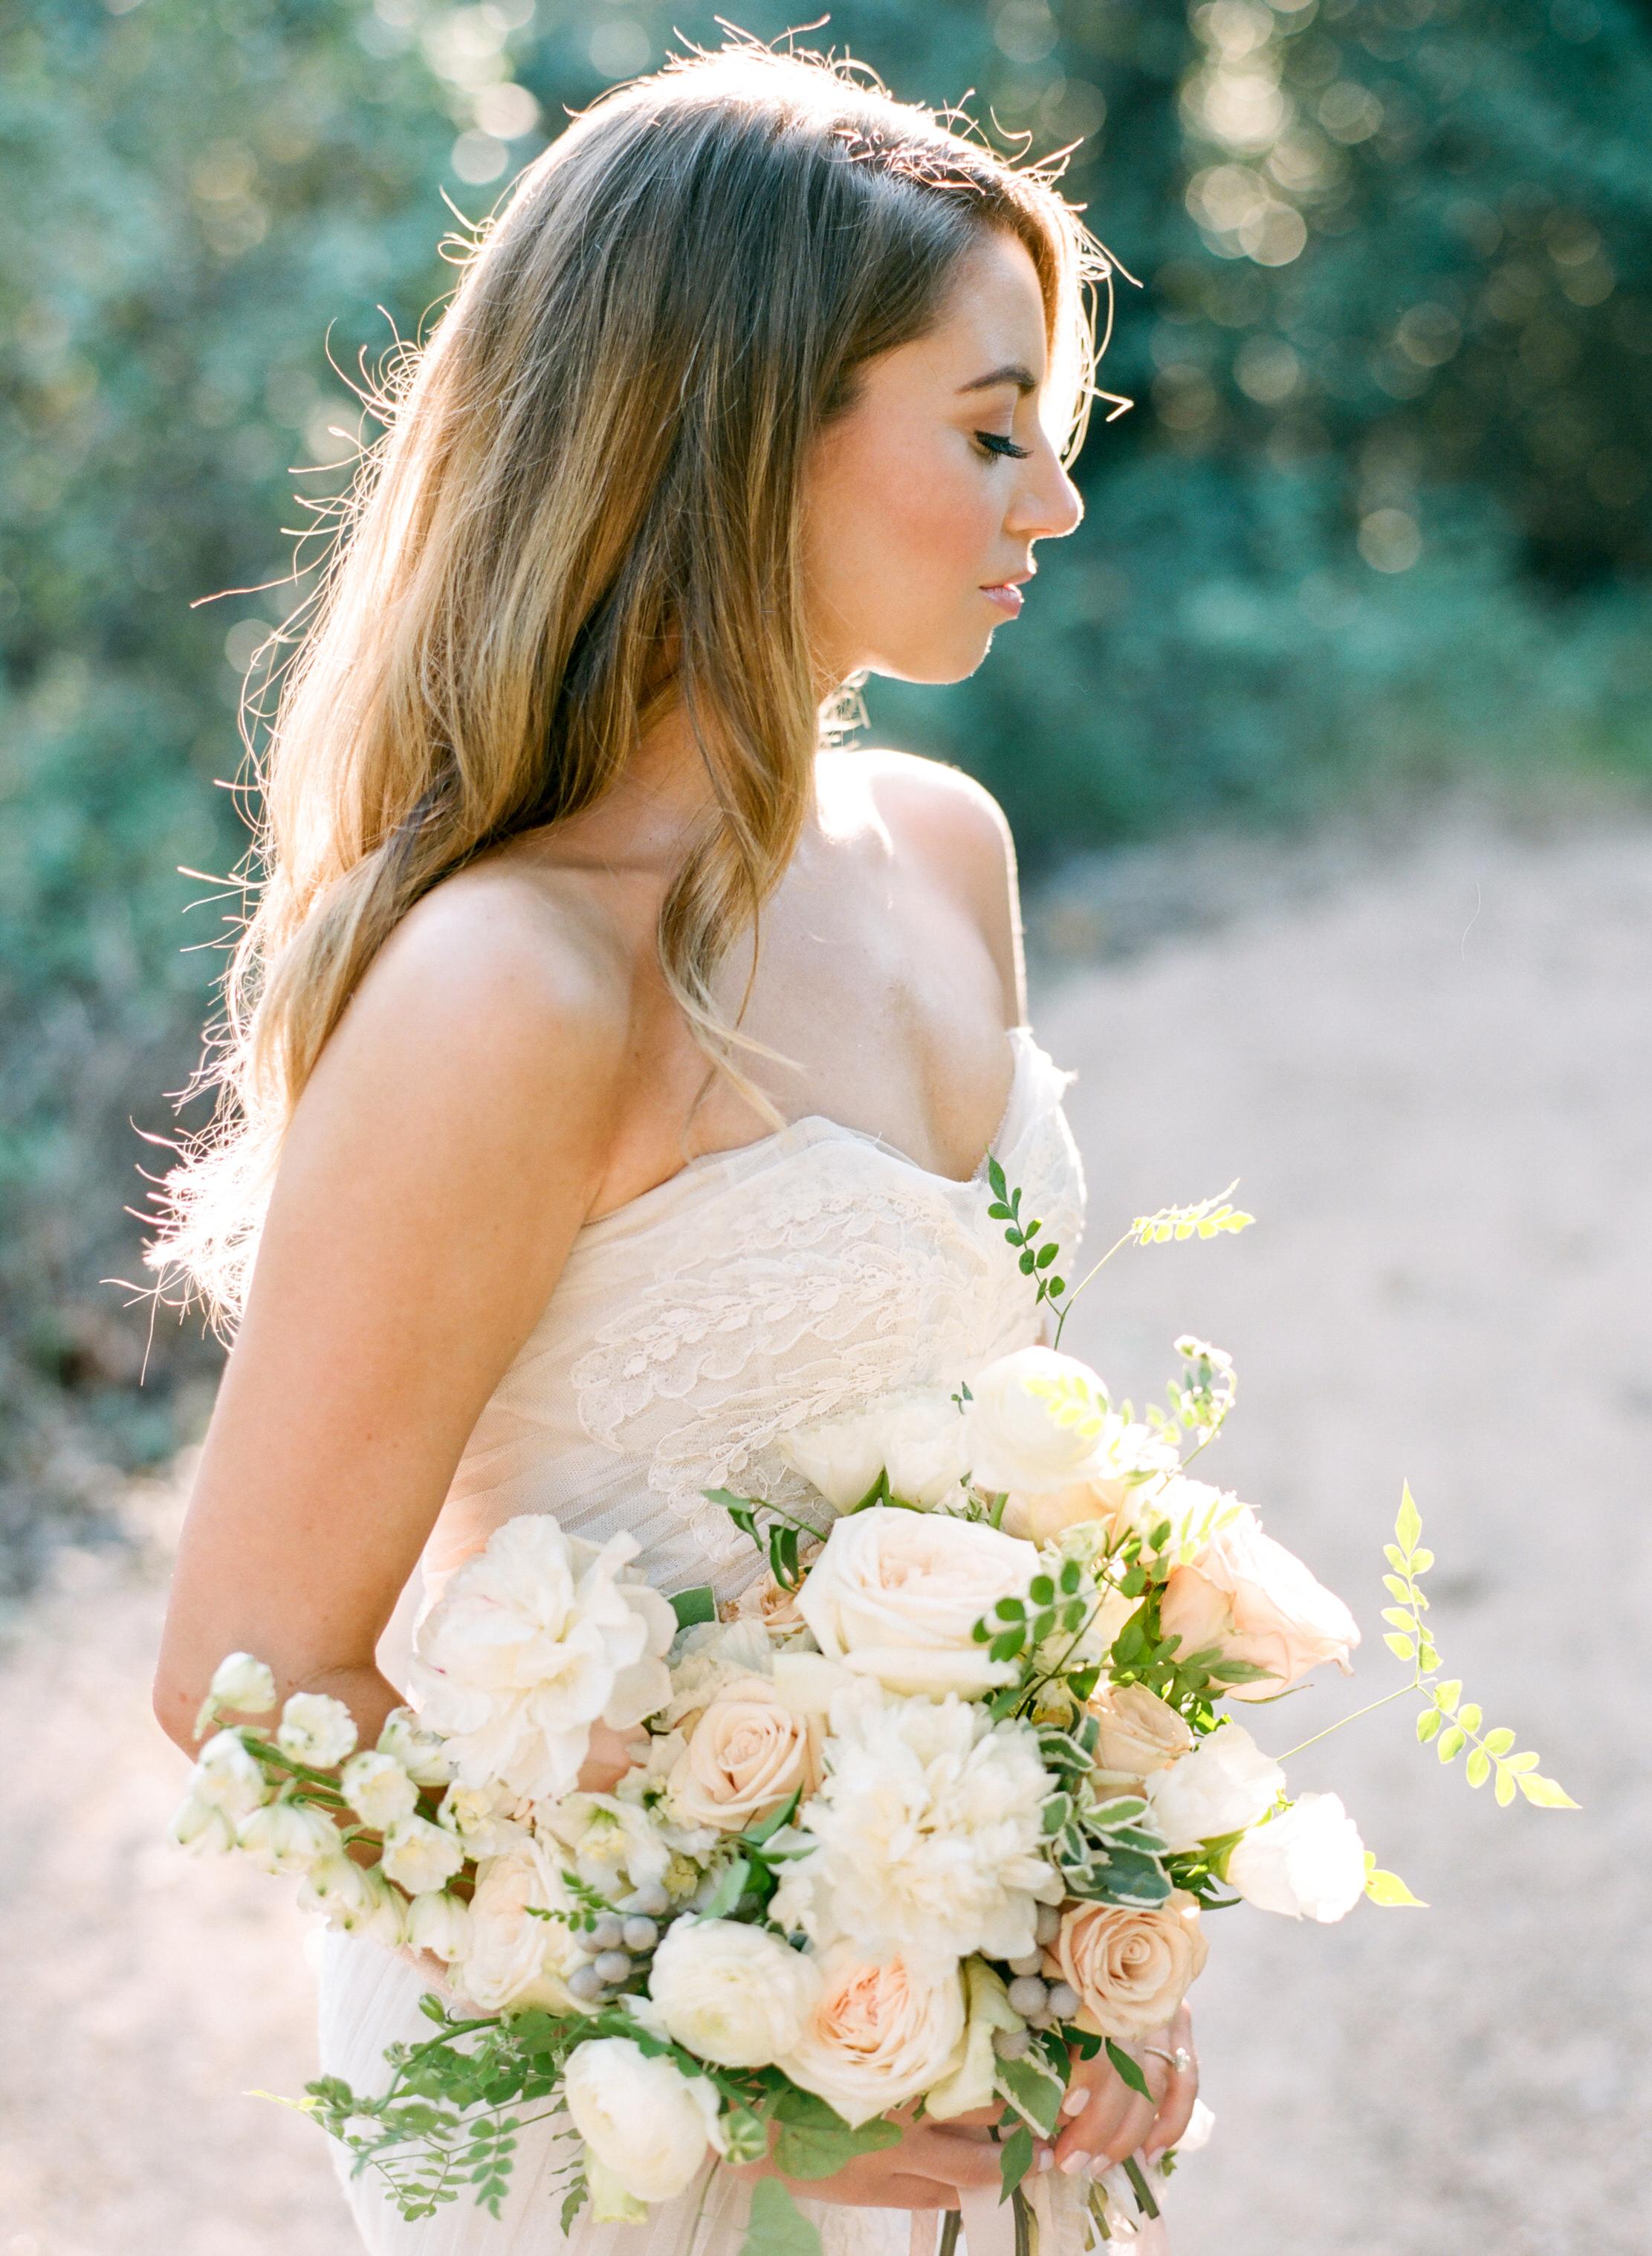 dana-fernandez-photography-the-wedding-chicks-film-houston-wedding-photography-destination-6.jpg